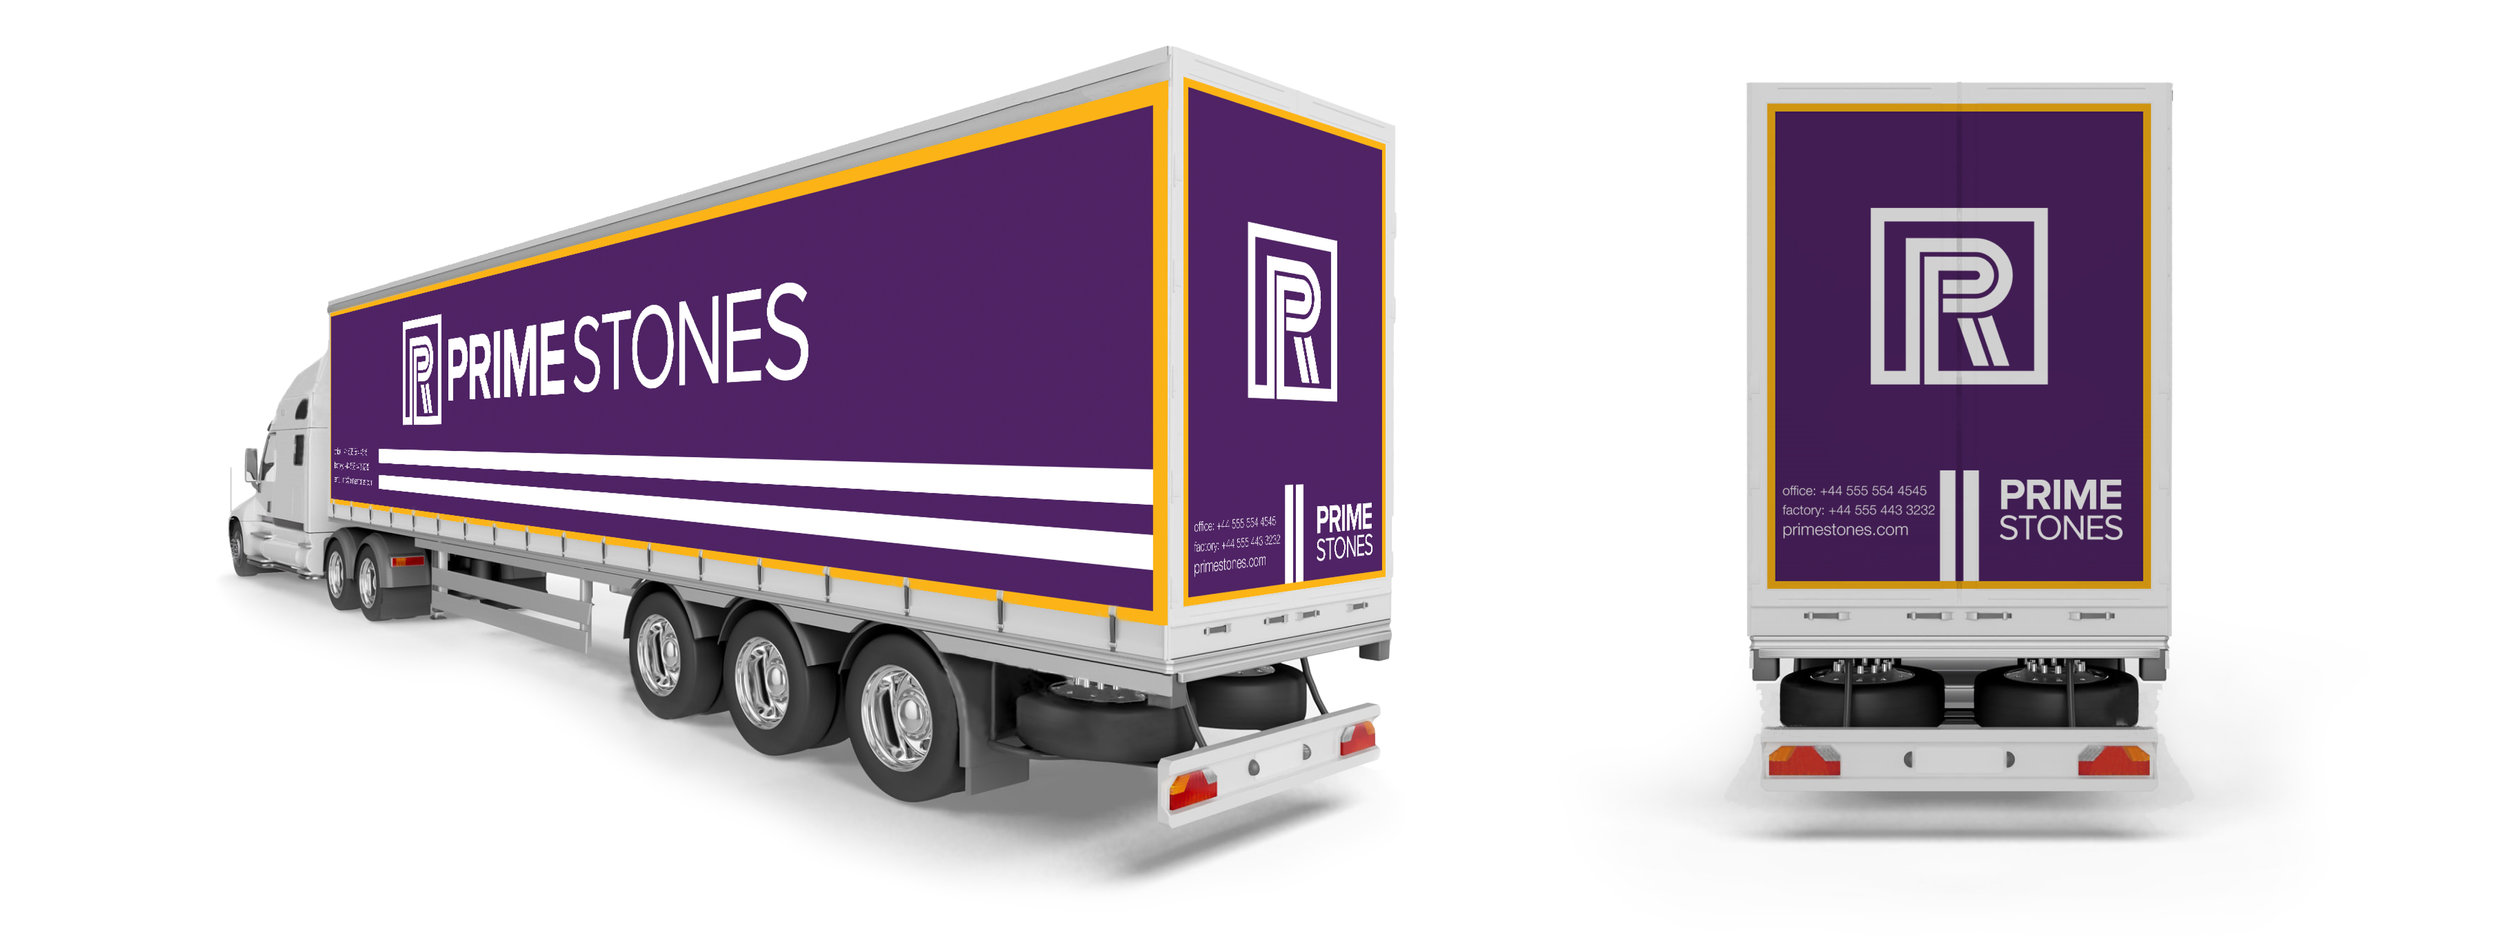 Toronto Brand strategy Design Consultancy studio – Prime Stones rebranding – Truck Livery design